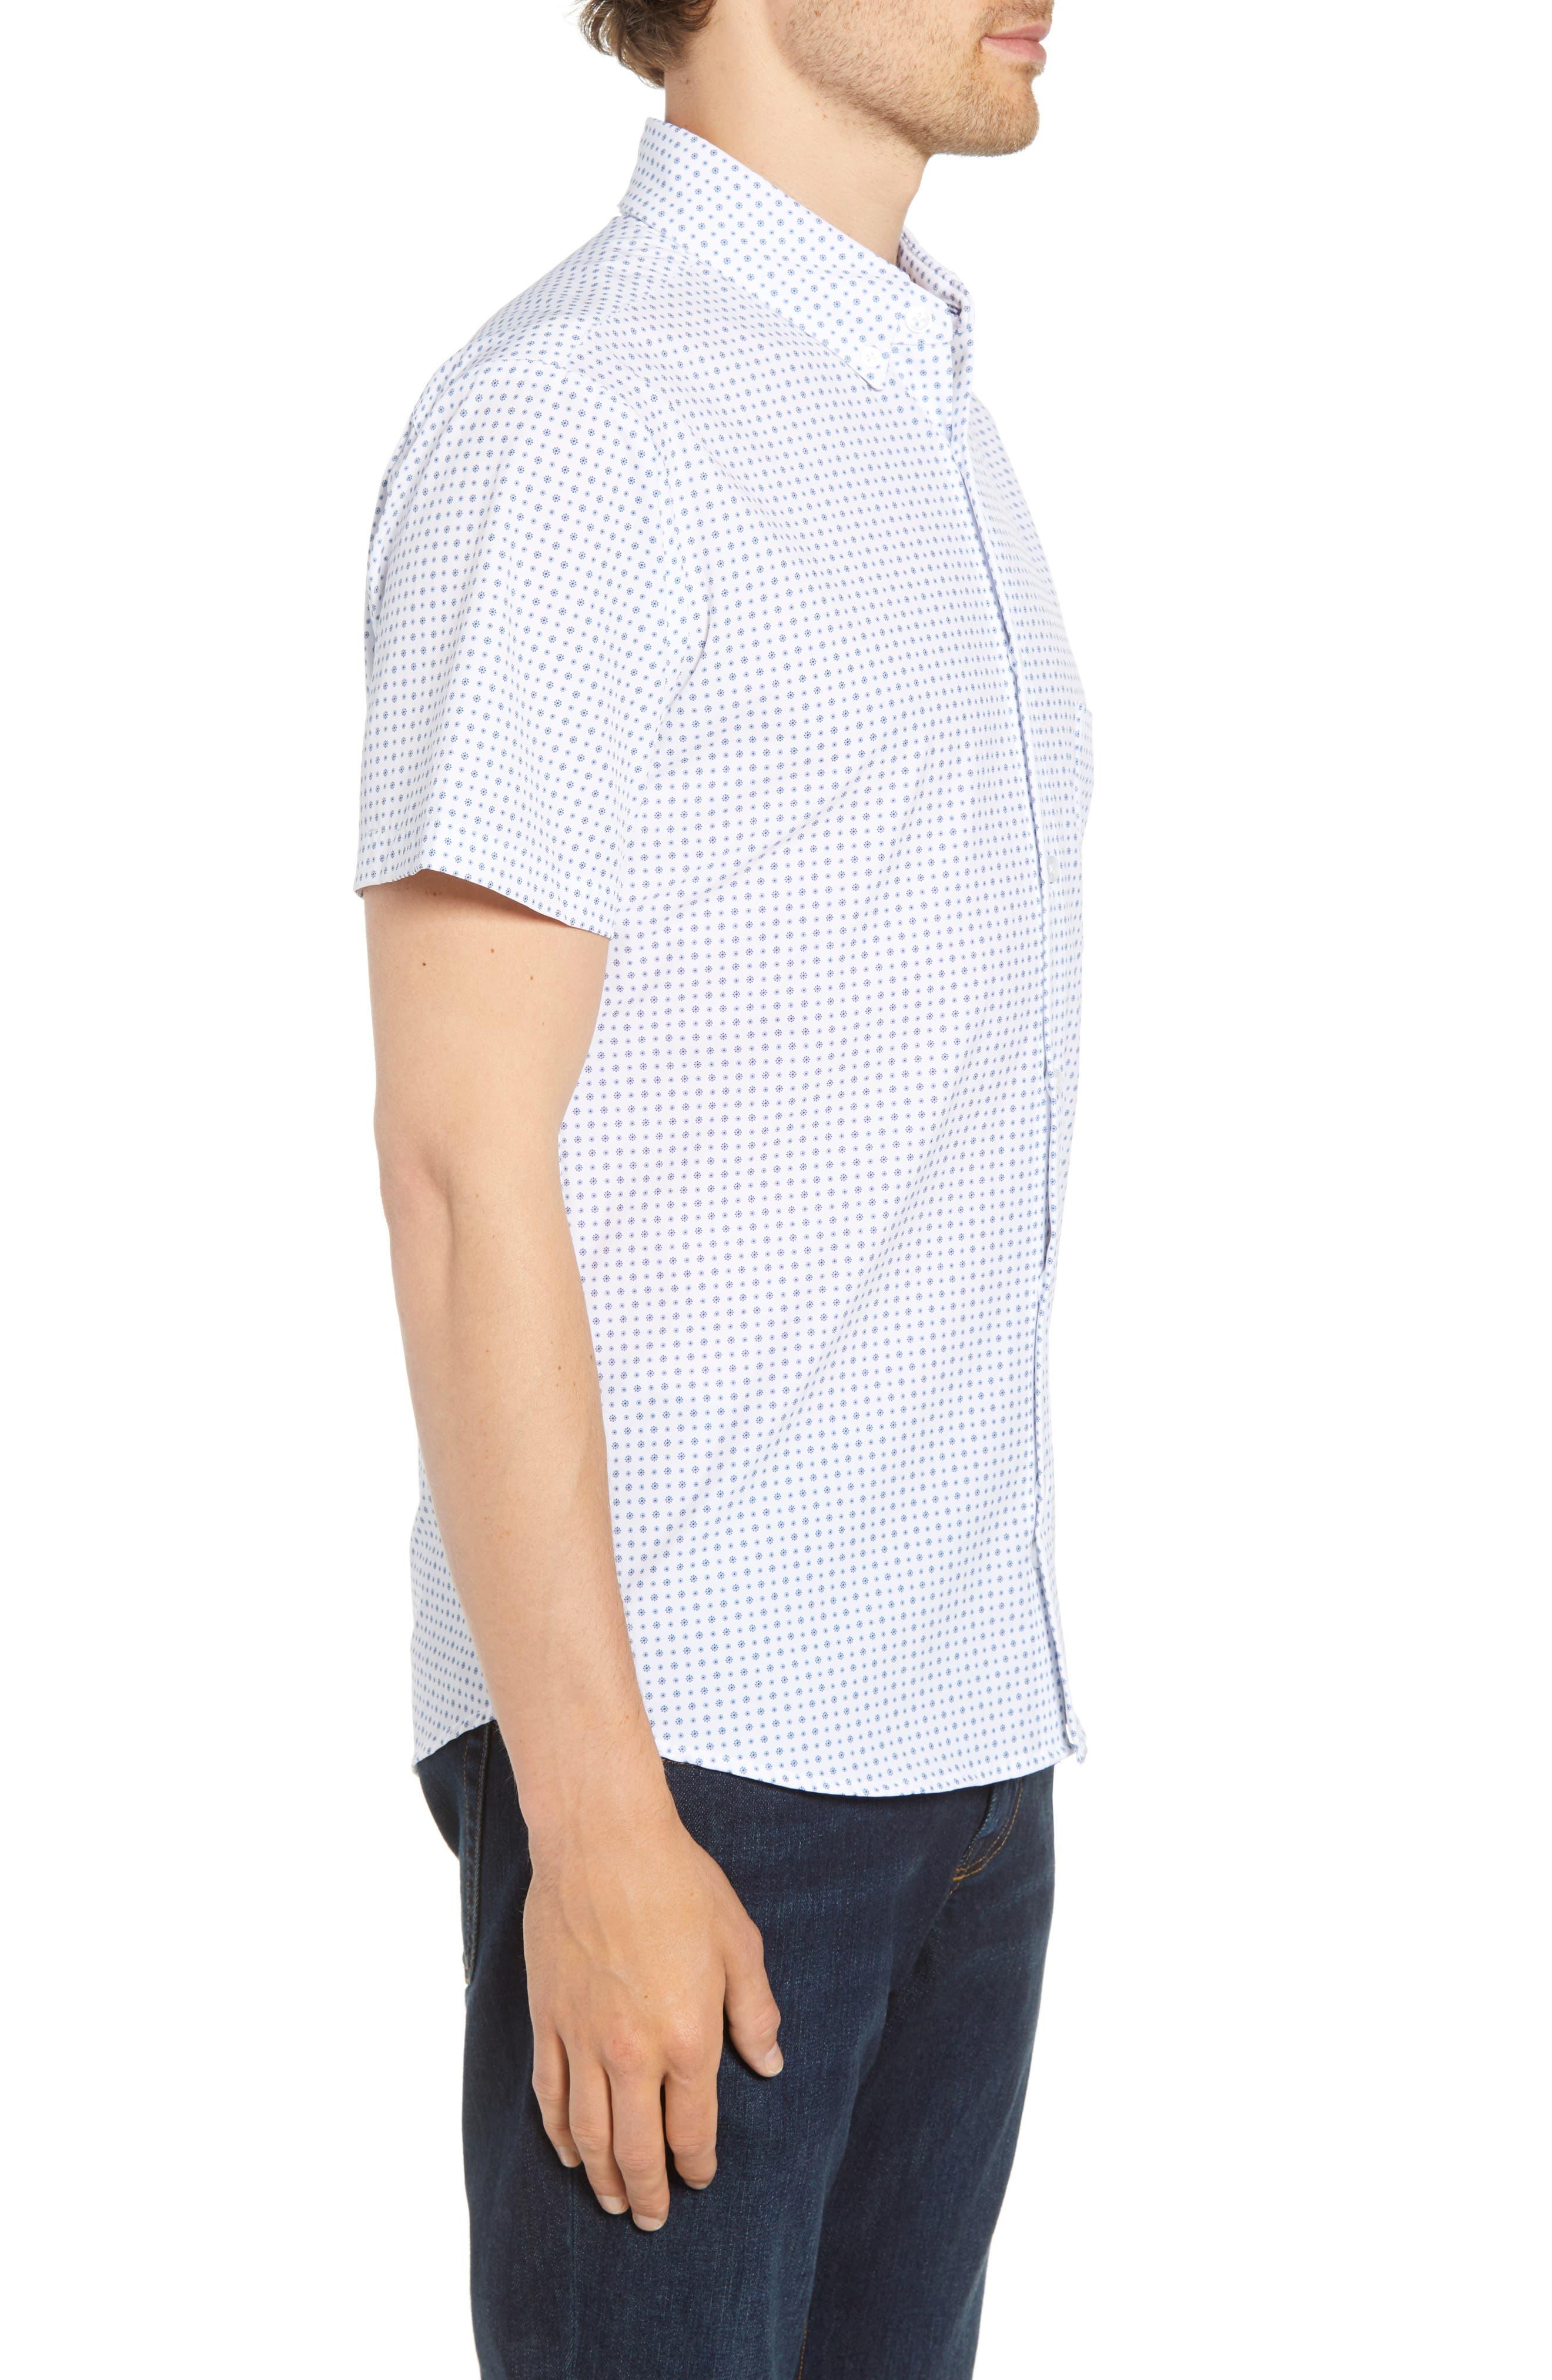 Darst Slim Fit Performance Sport Shirt,                             Alternate thumbnail 4, color,                             White